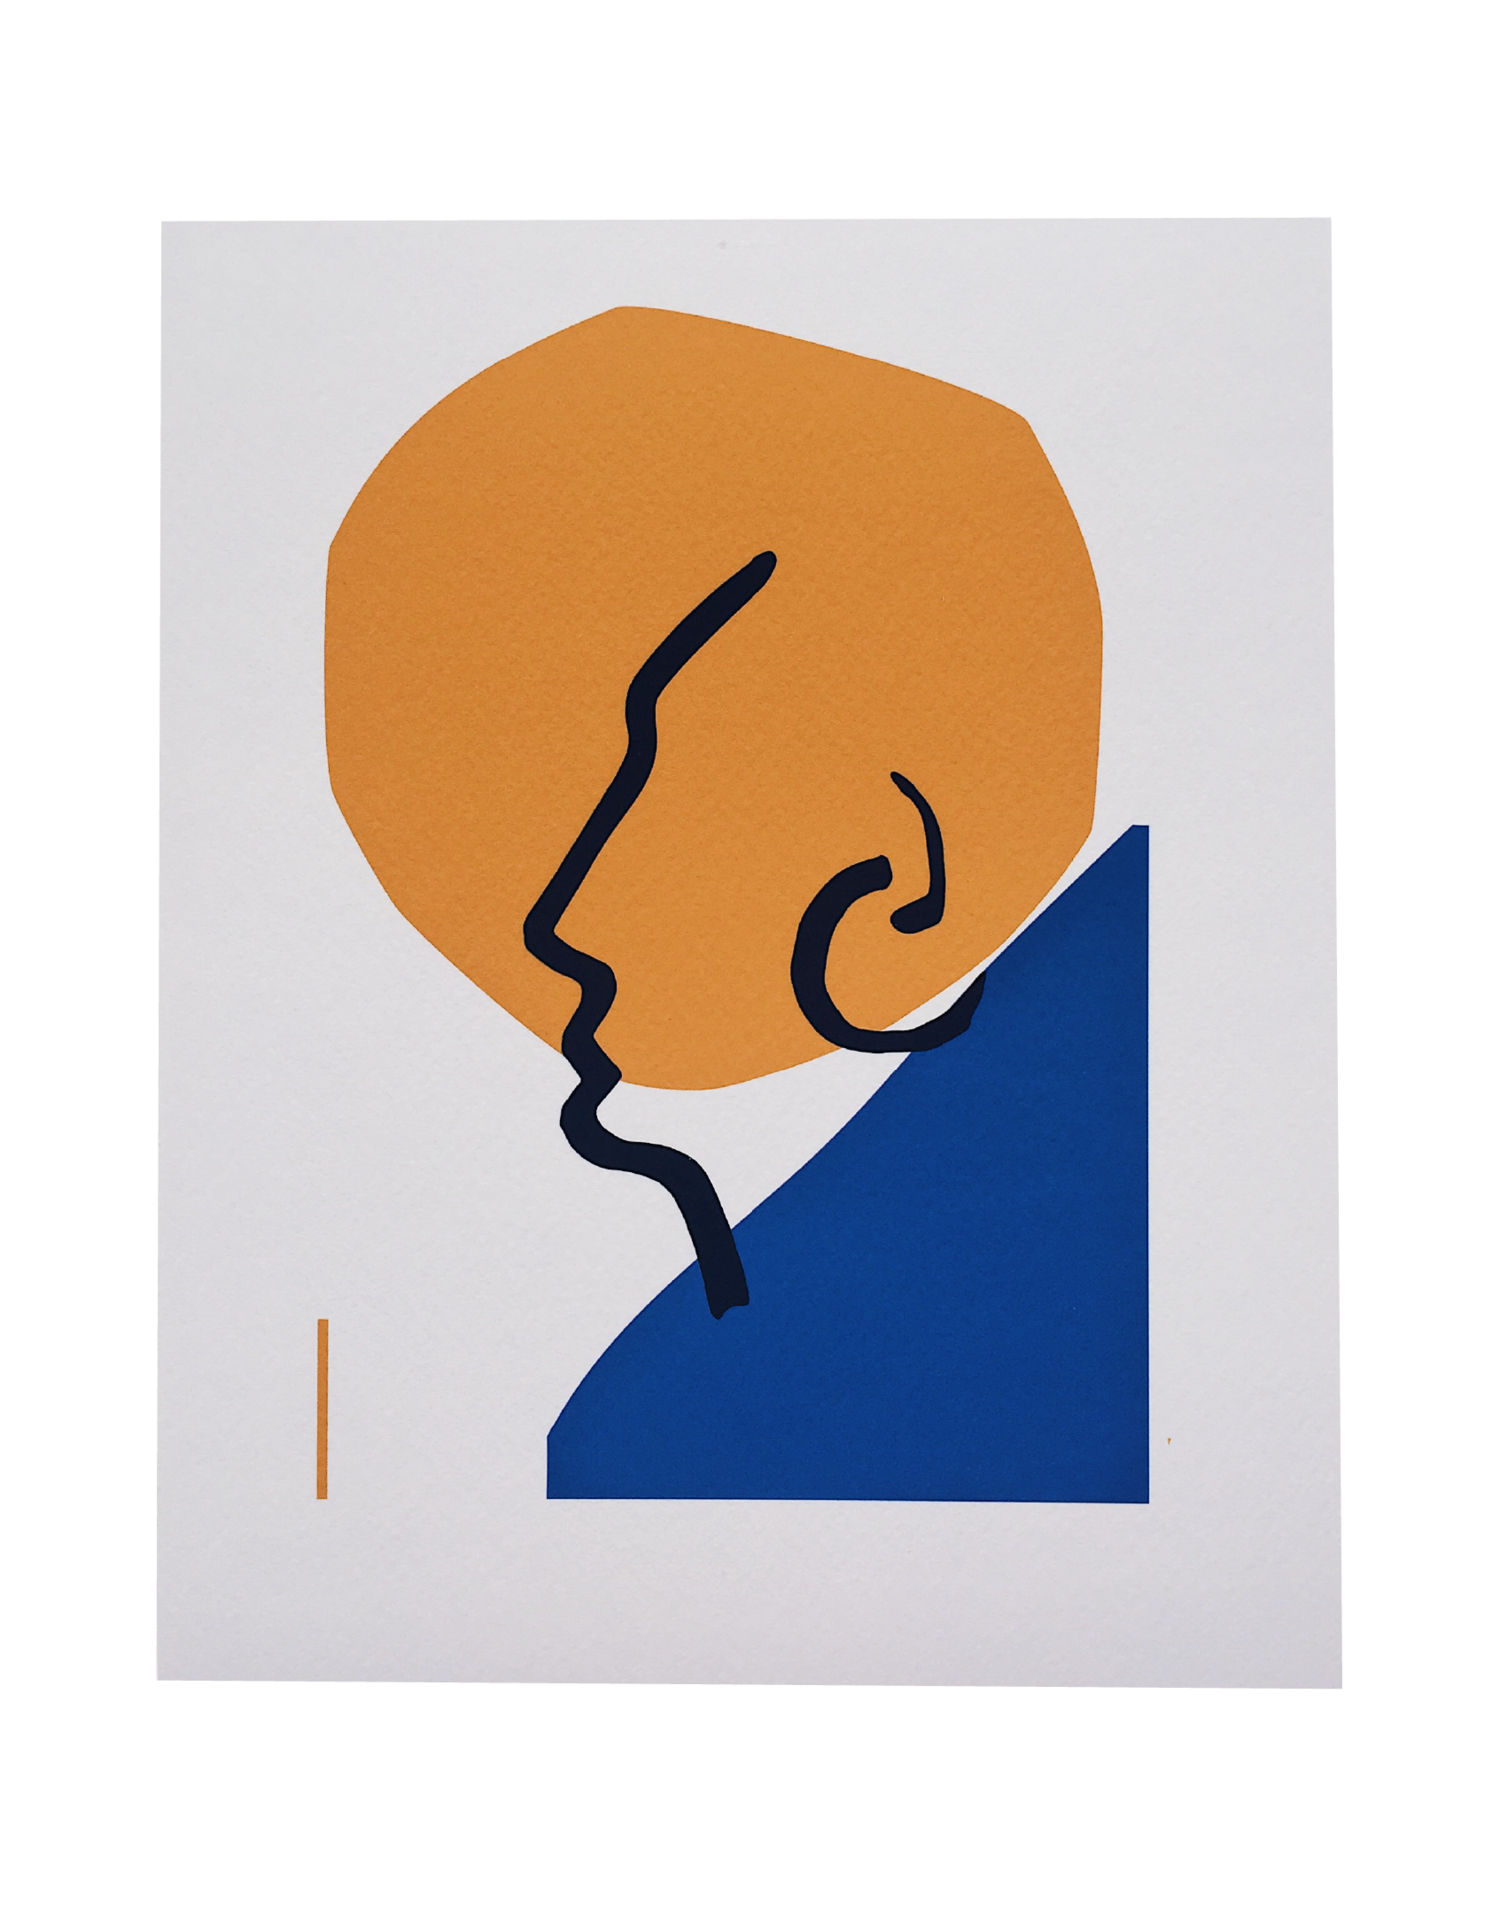 Collab with James Wilson Set of 4 Giclée Prints